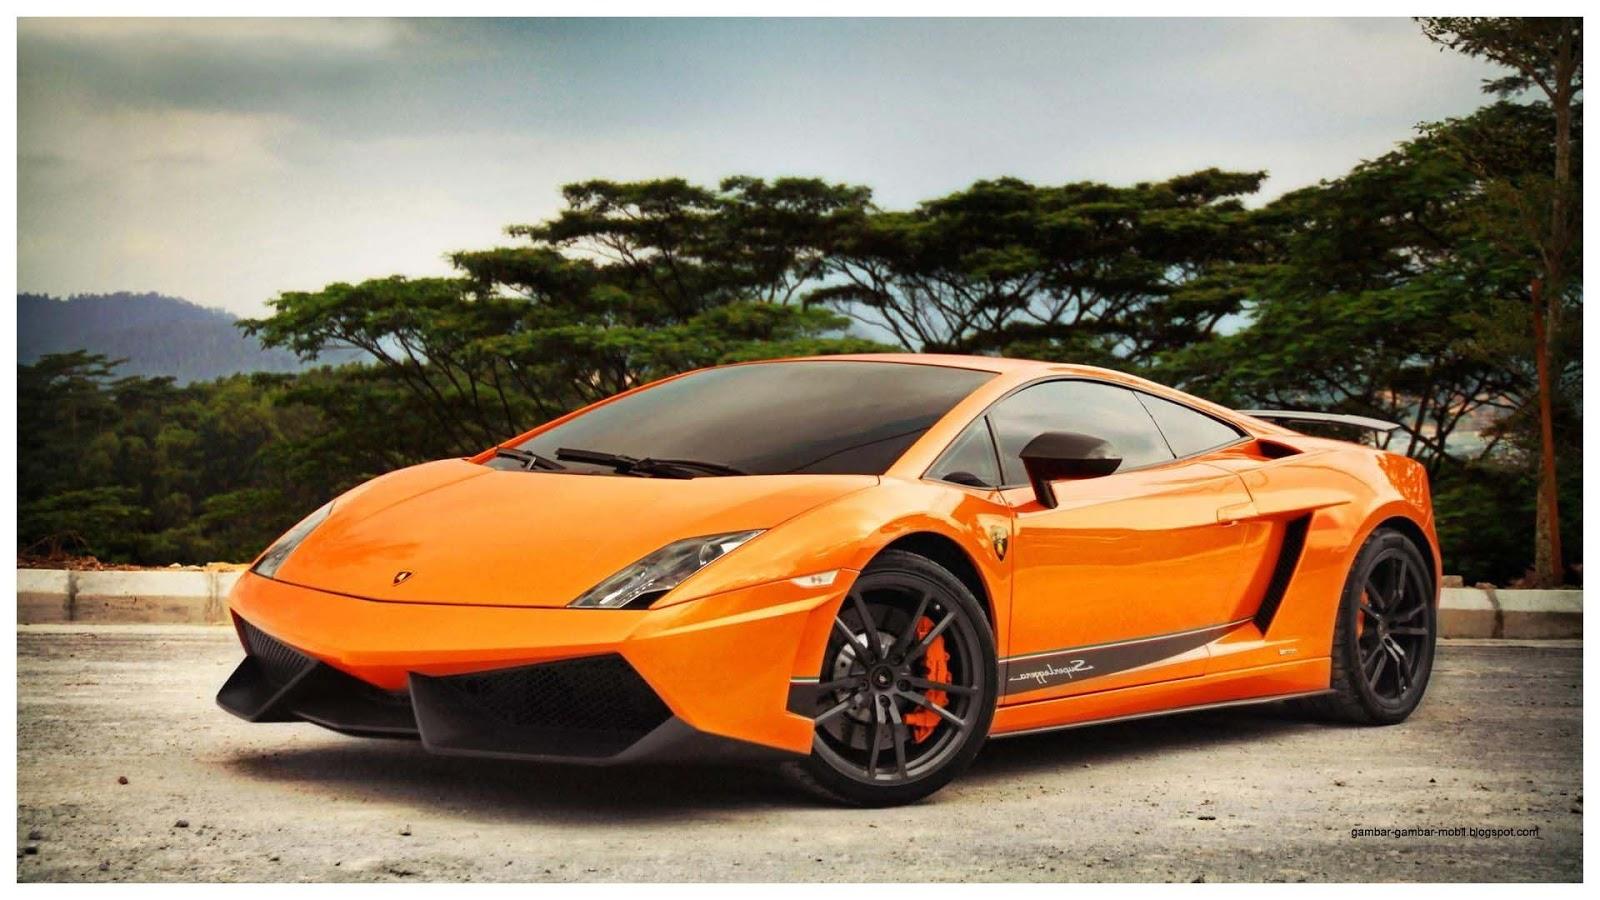 Foto Modif Mobil Lamborghini Modifikasi Style